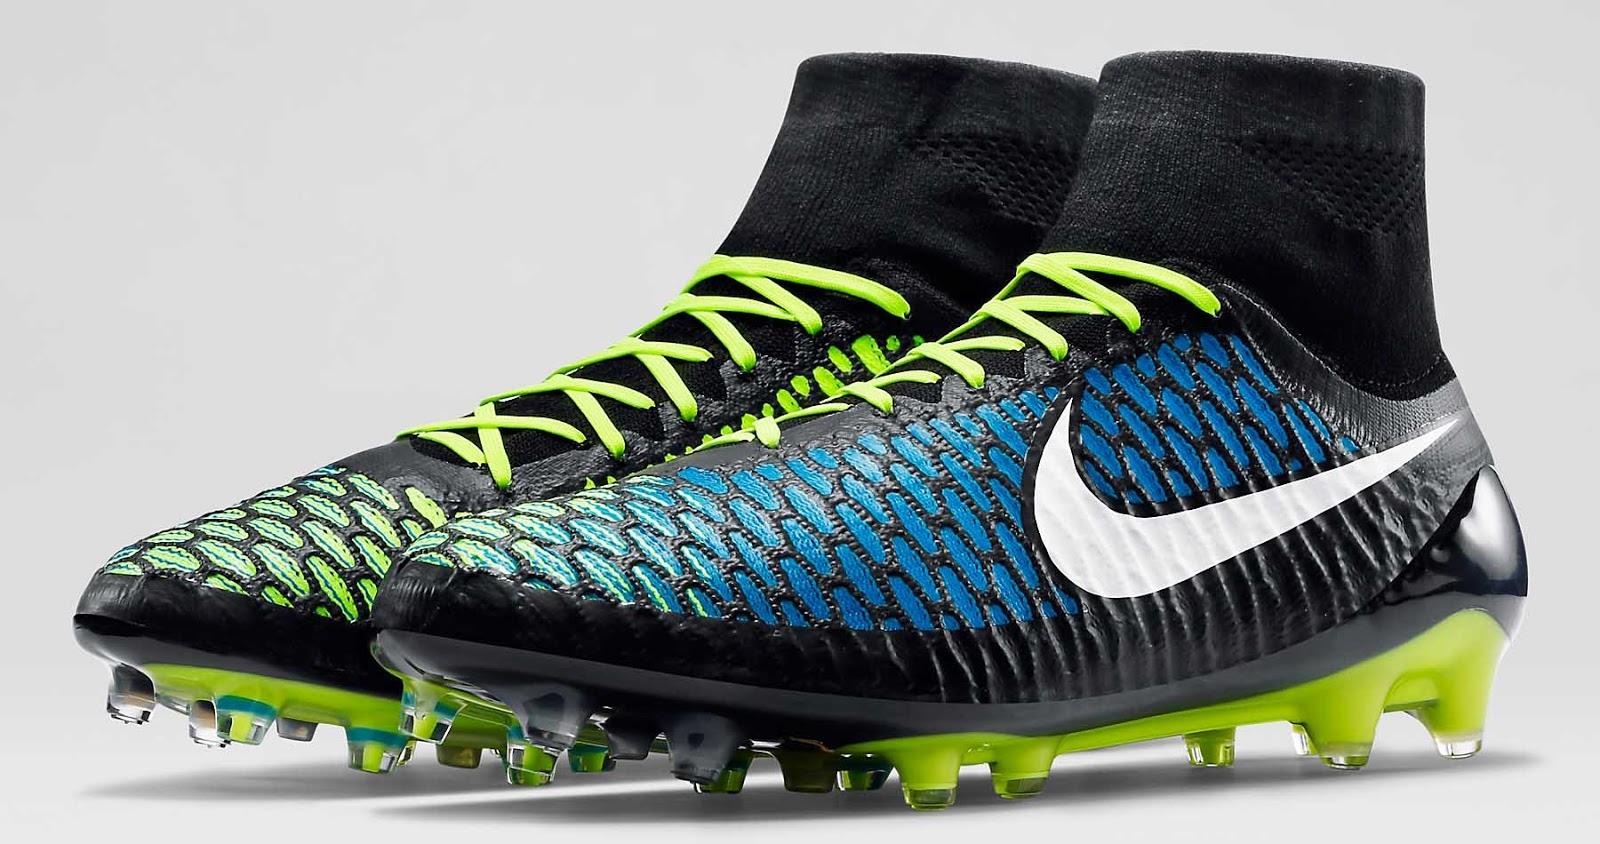 [Aporte] Botines Nike Magista Obra, Adizero F50, etc. Nike-Magista-Obra-Black-Blue-Volt%2B(1)